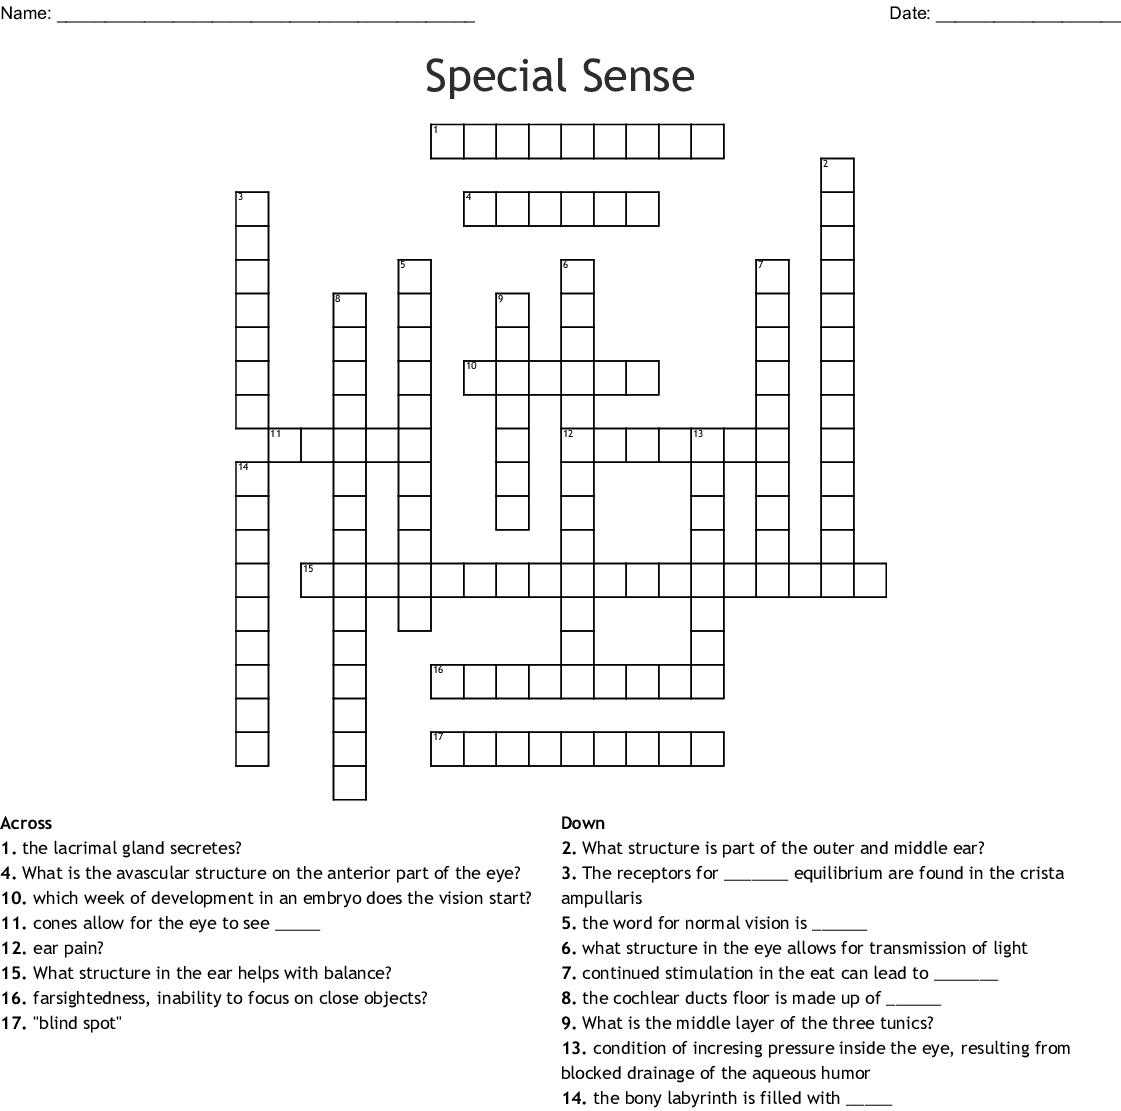 Chapter 10 Special Senses Worksheet Answers - Worksheet List